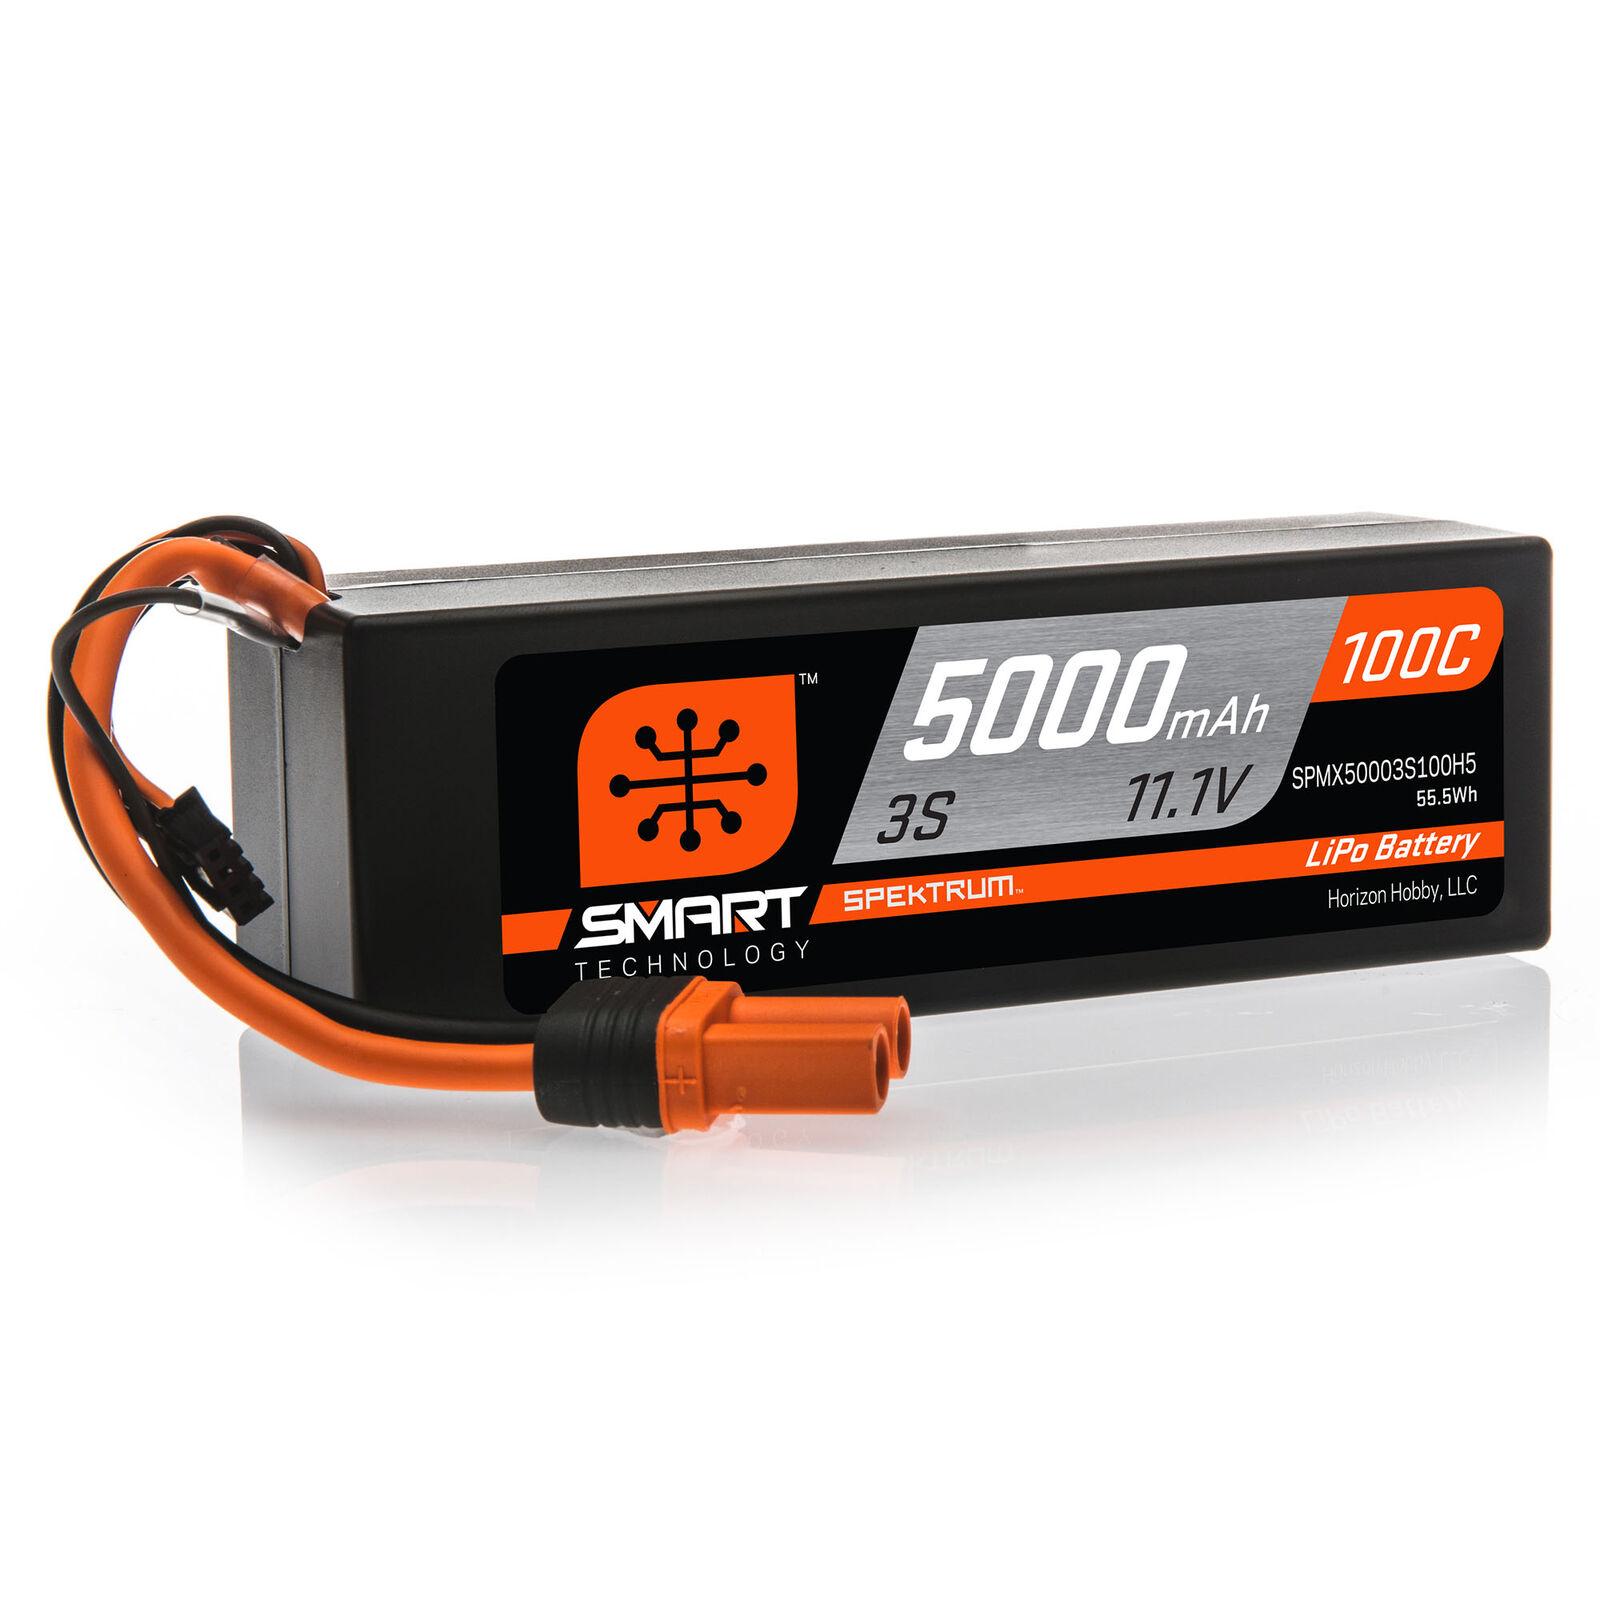 11.1V 5000mAh 3S 100C Smart Hardcase LiPo Battery: IC5